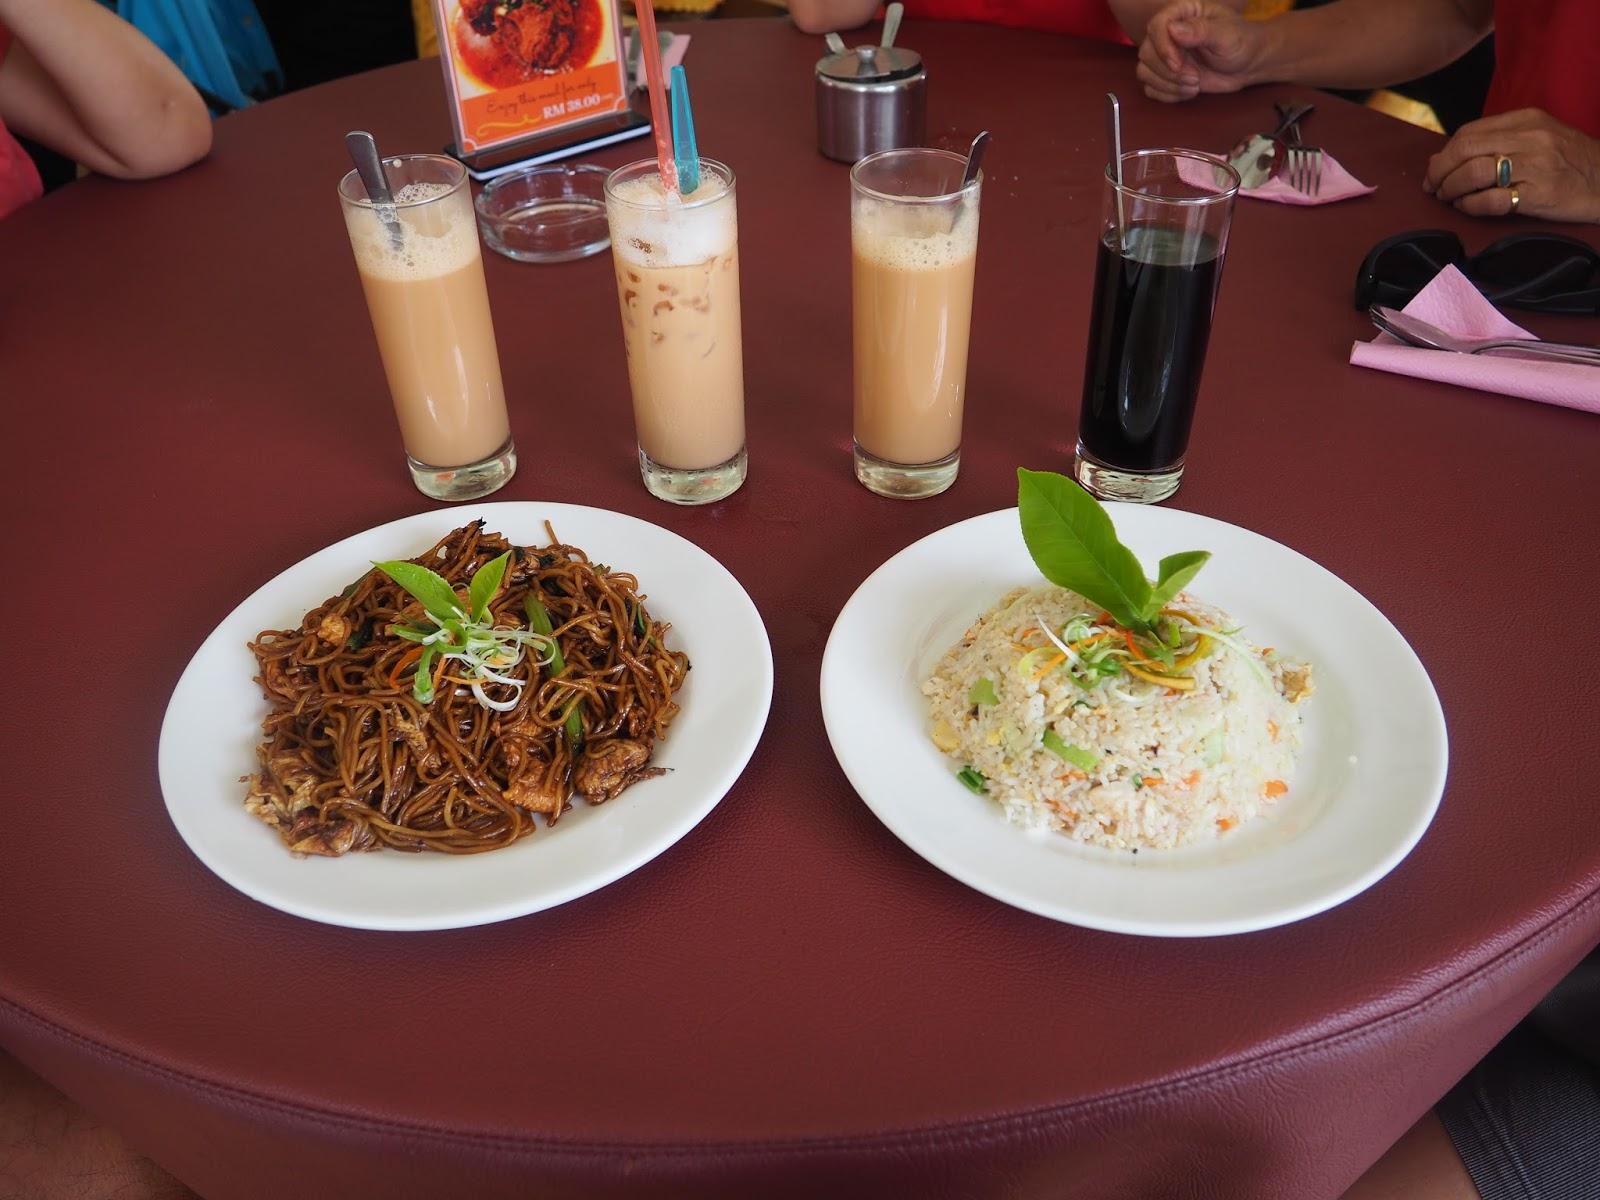 Malysai foodie food sabah eats borneo